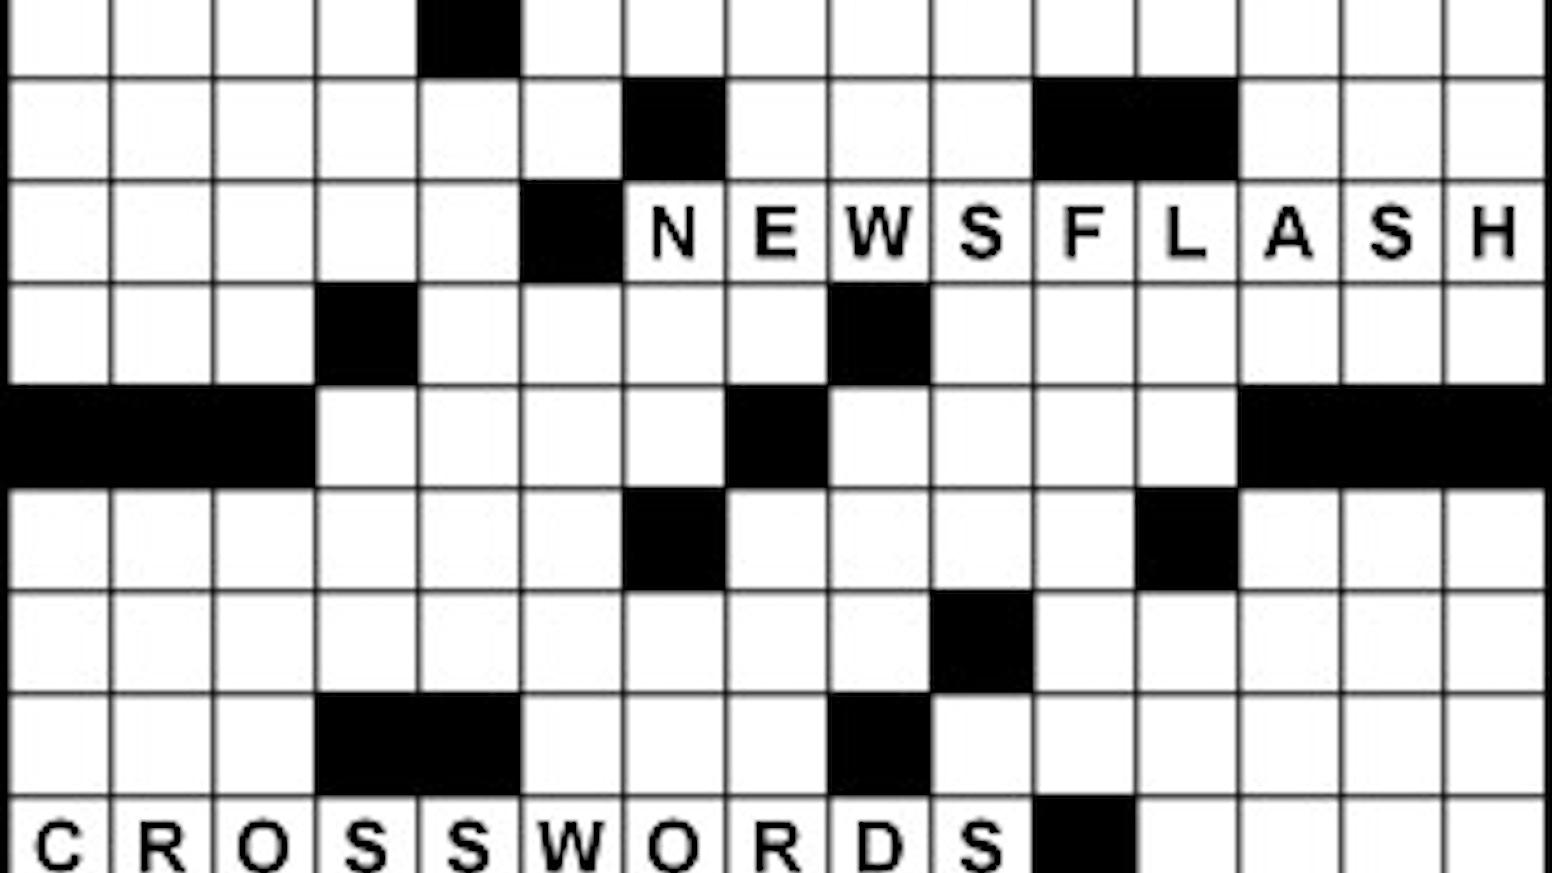 2016-17 Fireball Newsflash Crosswords by Peter Gordon